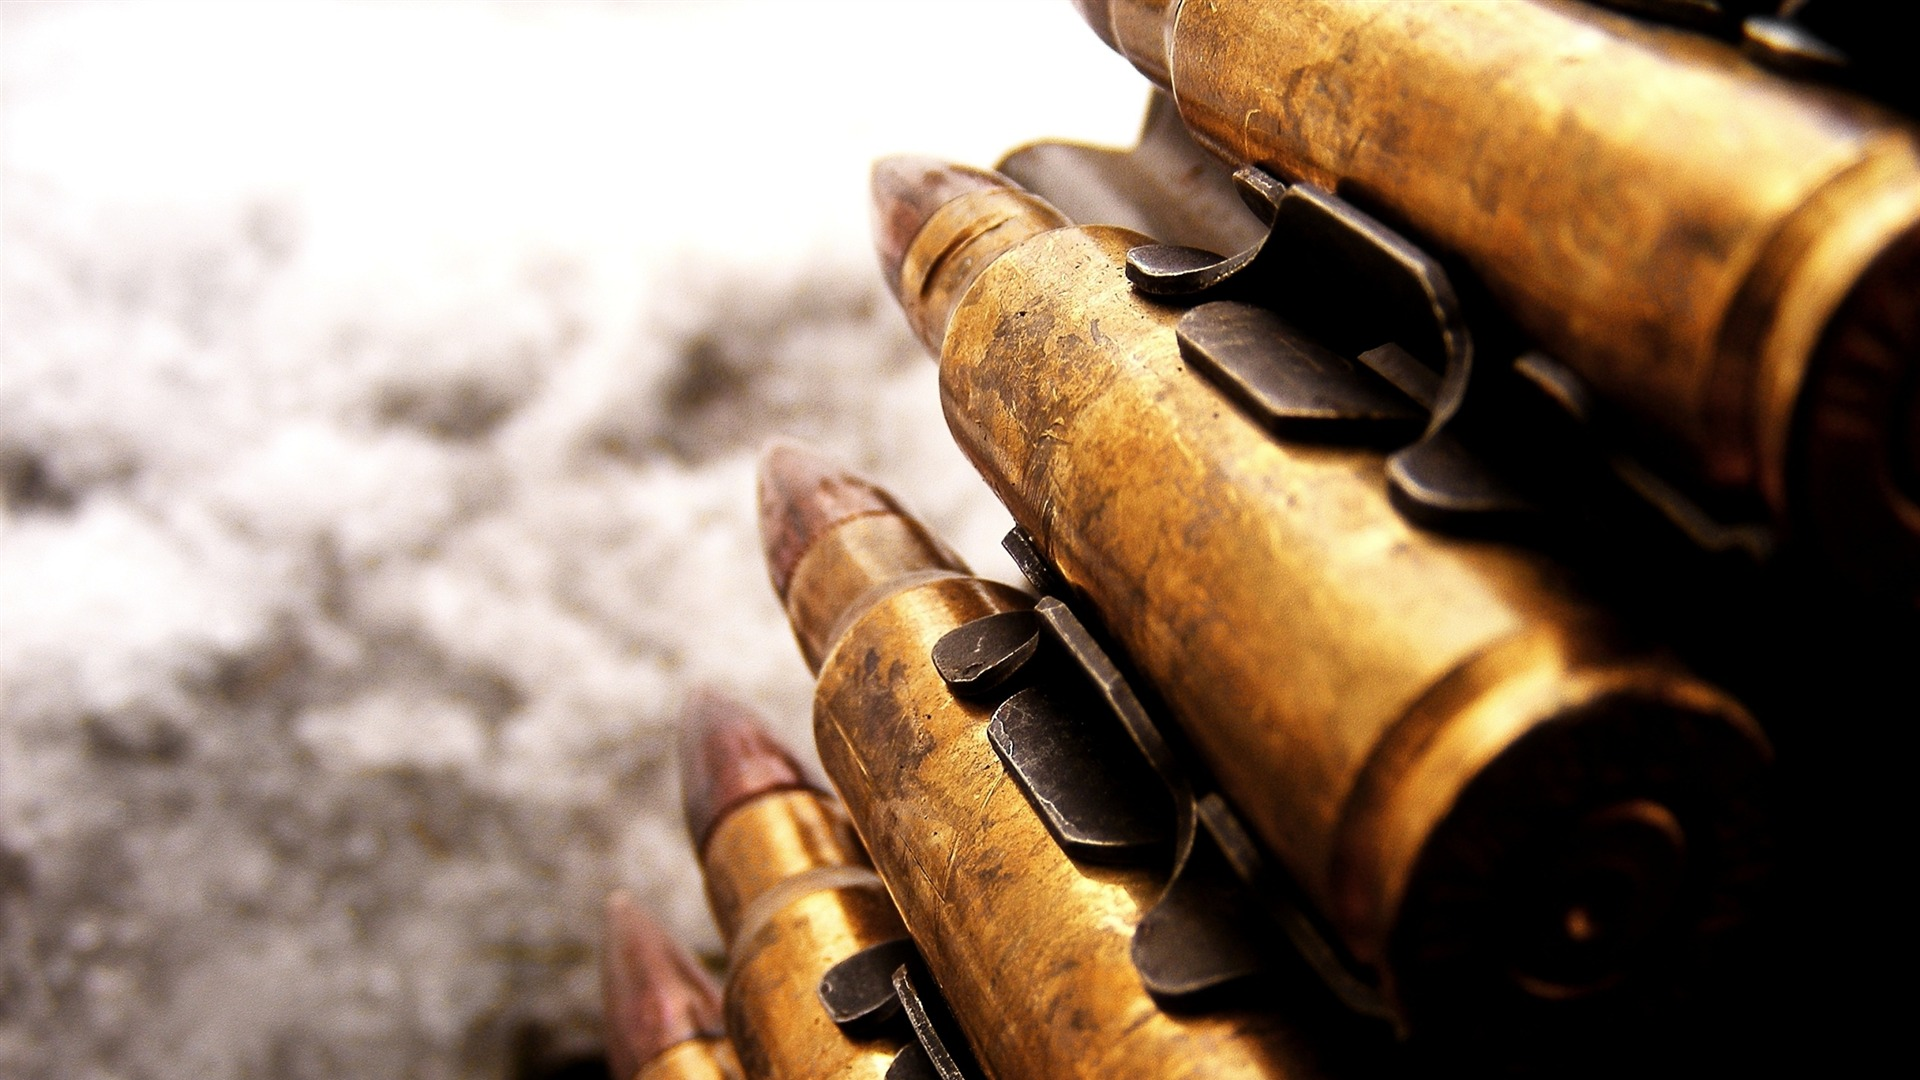 Bullets Military Desktop Wallpaper Avance 10wallpapercom